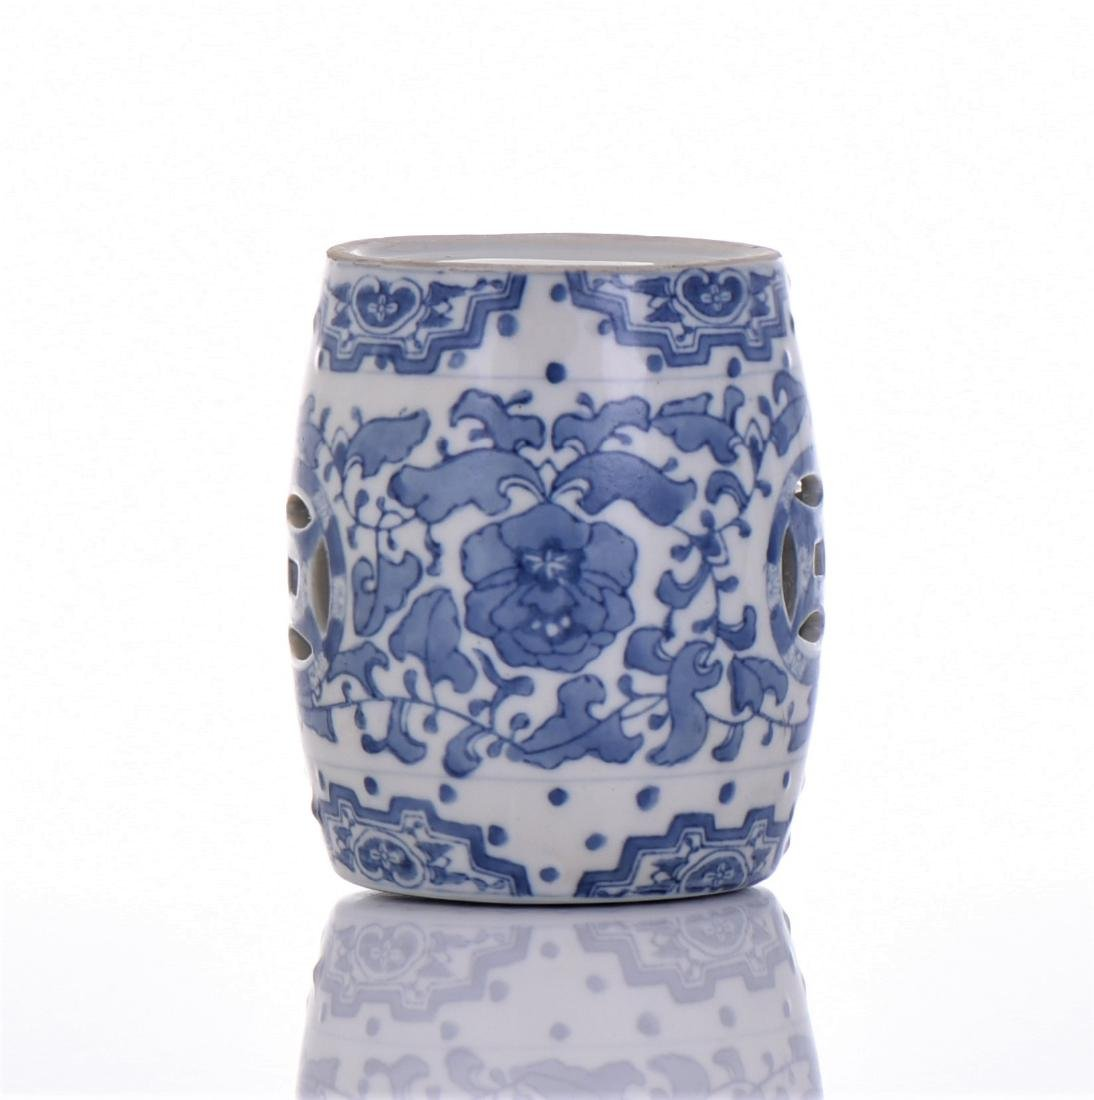 Blue And White Porcelain Miniature Garden Stool - 4